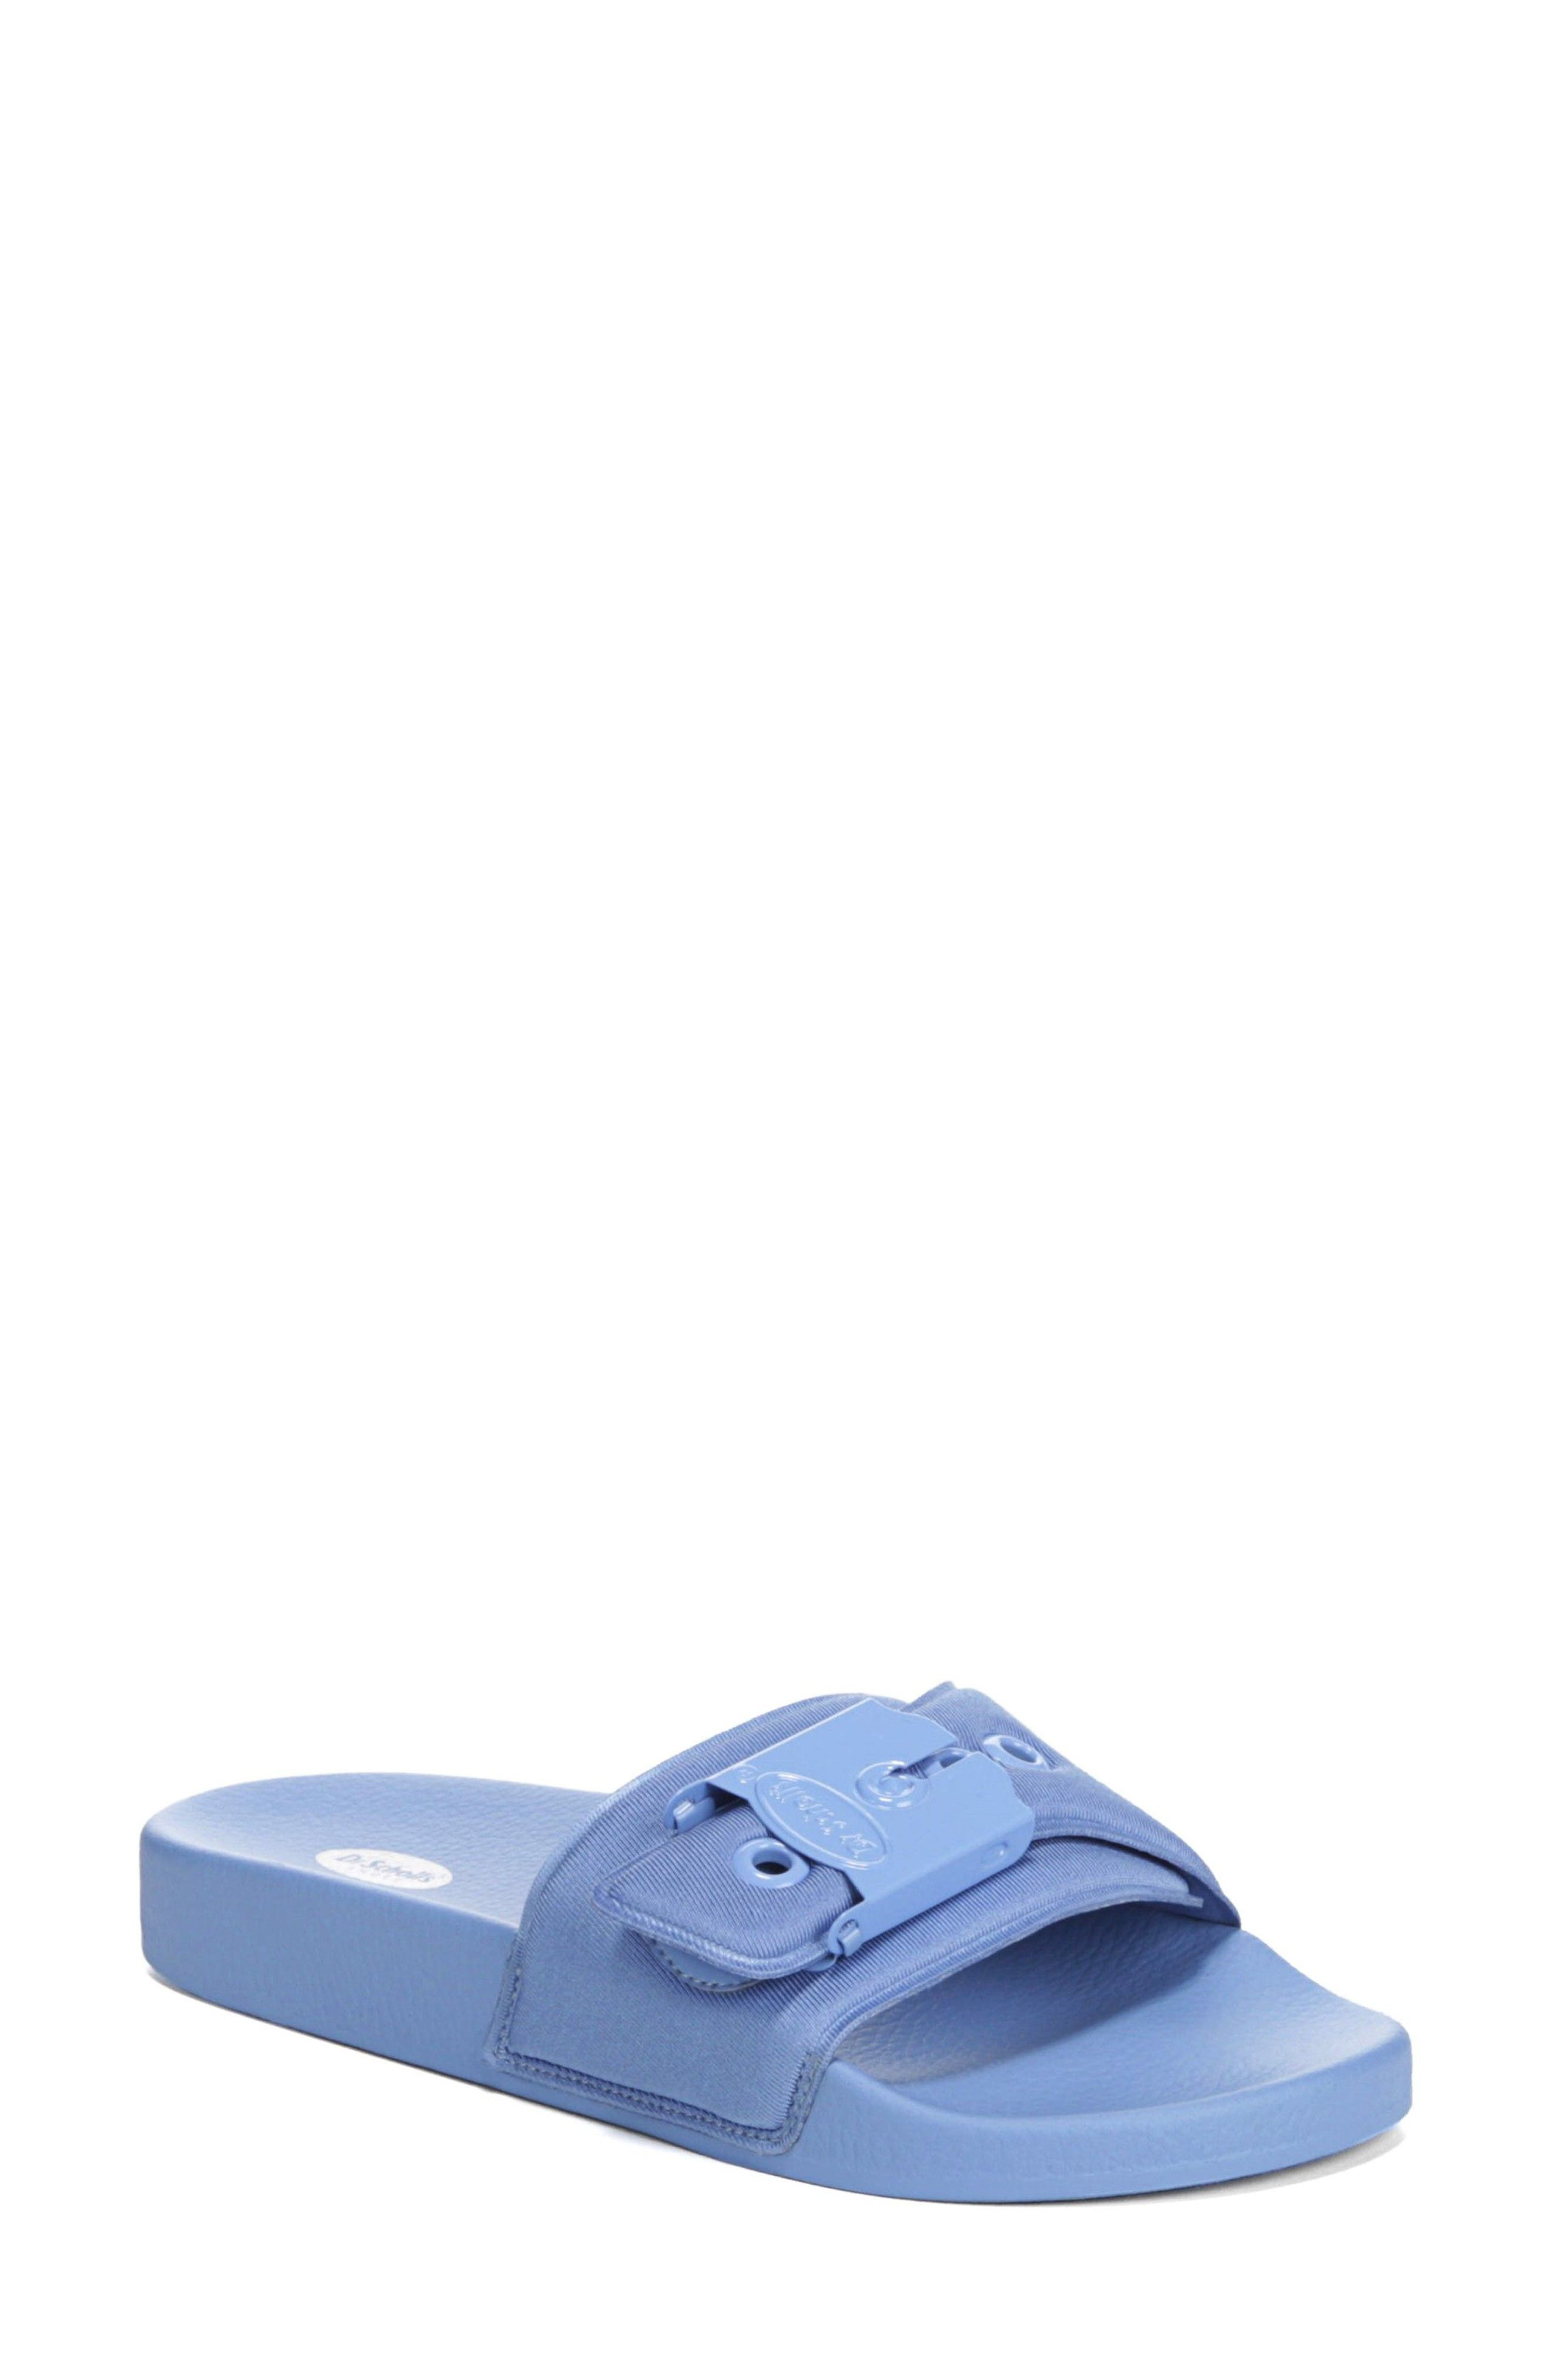 Original Pool Slide Sandal,                         Main,                         color, BLUE